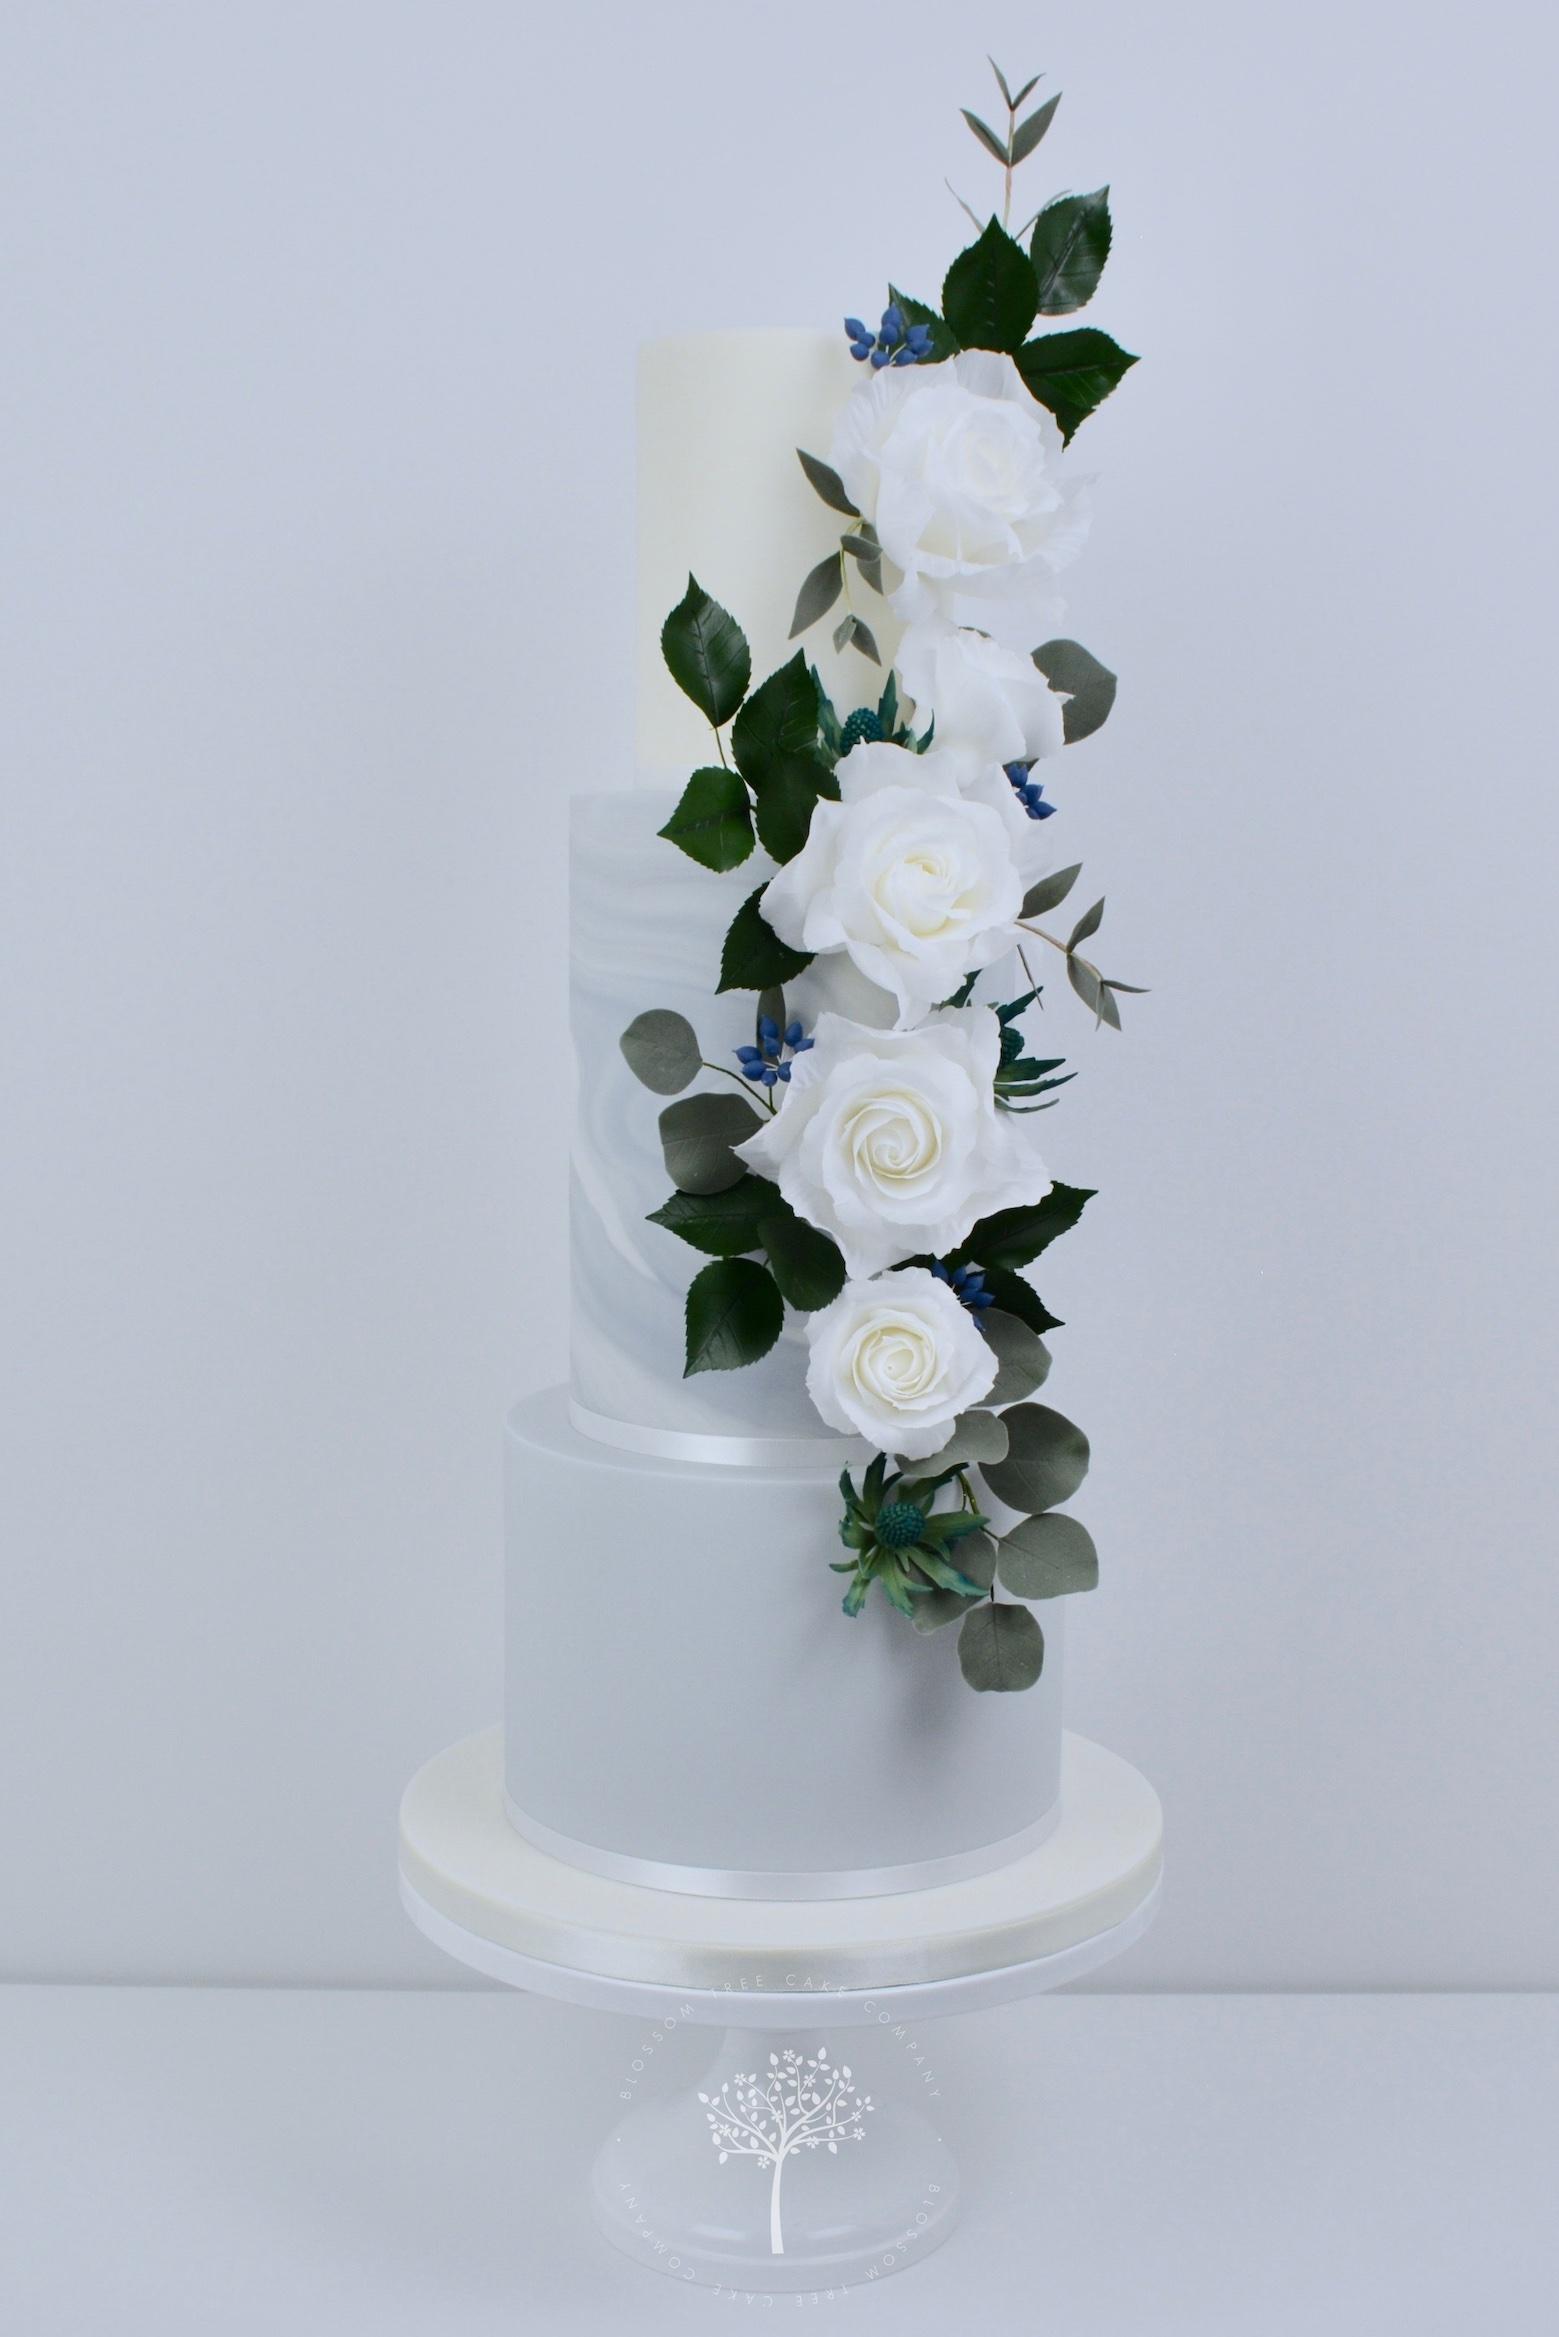 White Roses Cascade wedding cake by Blossom Tree Cake Company Harrogate North Yorkshire.jpg